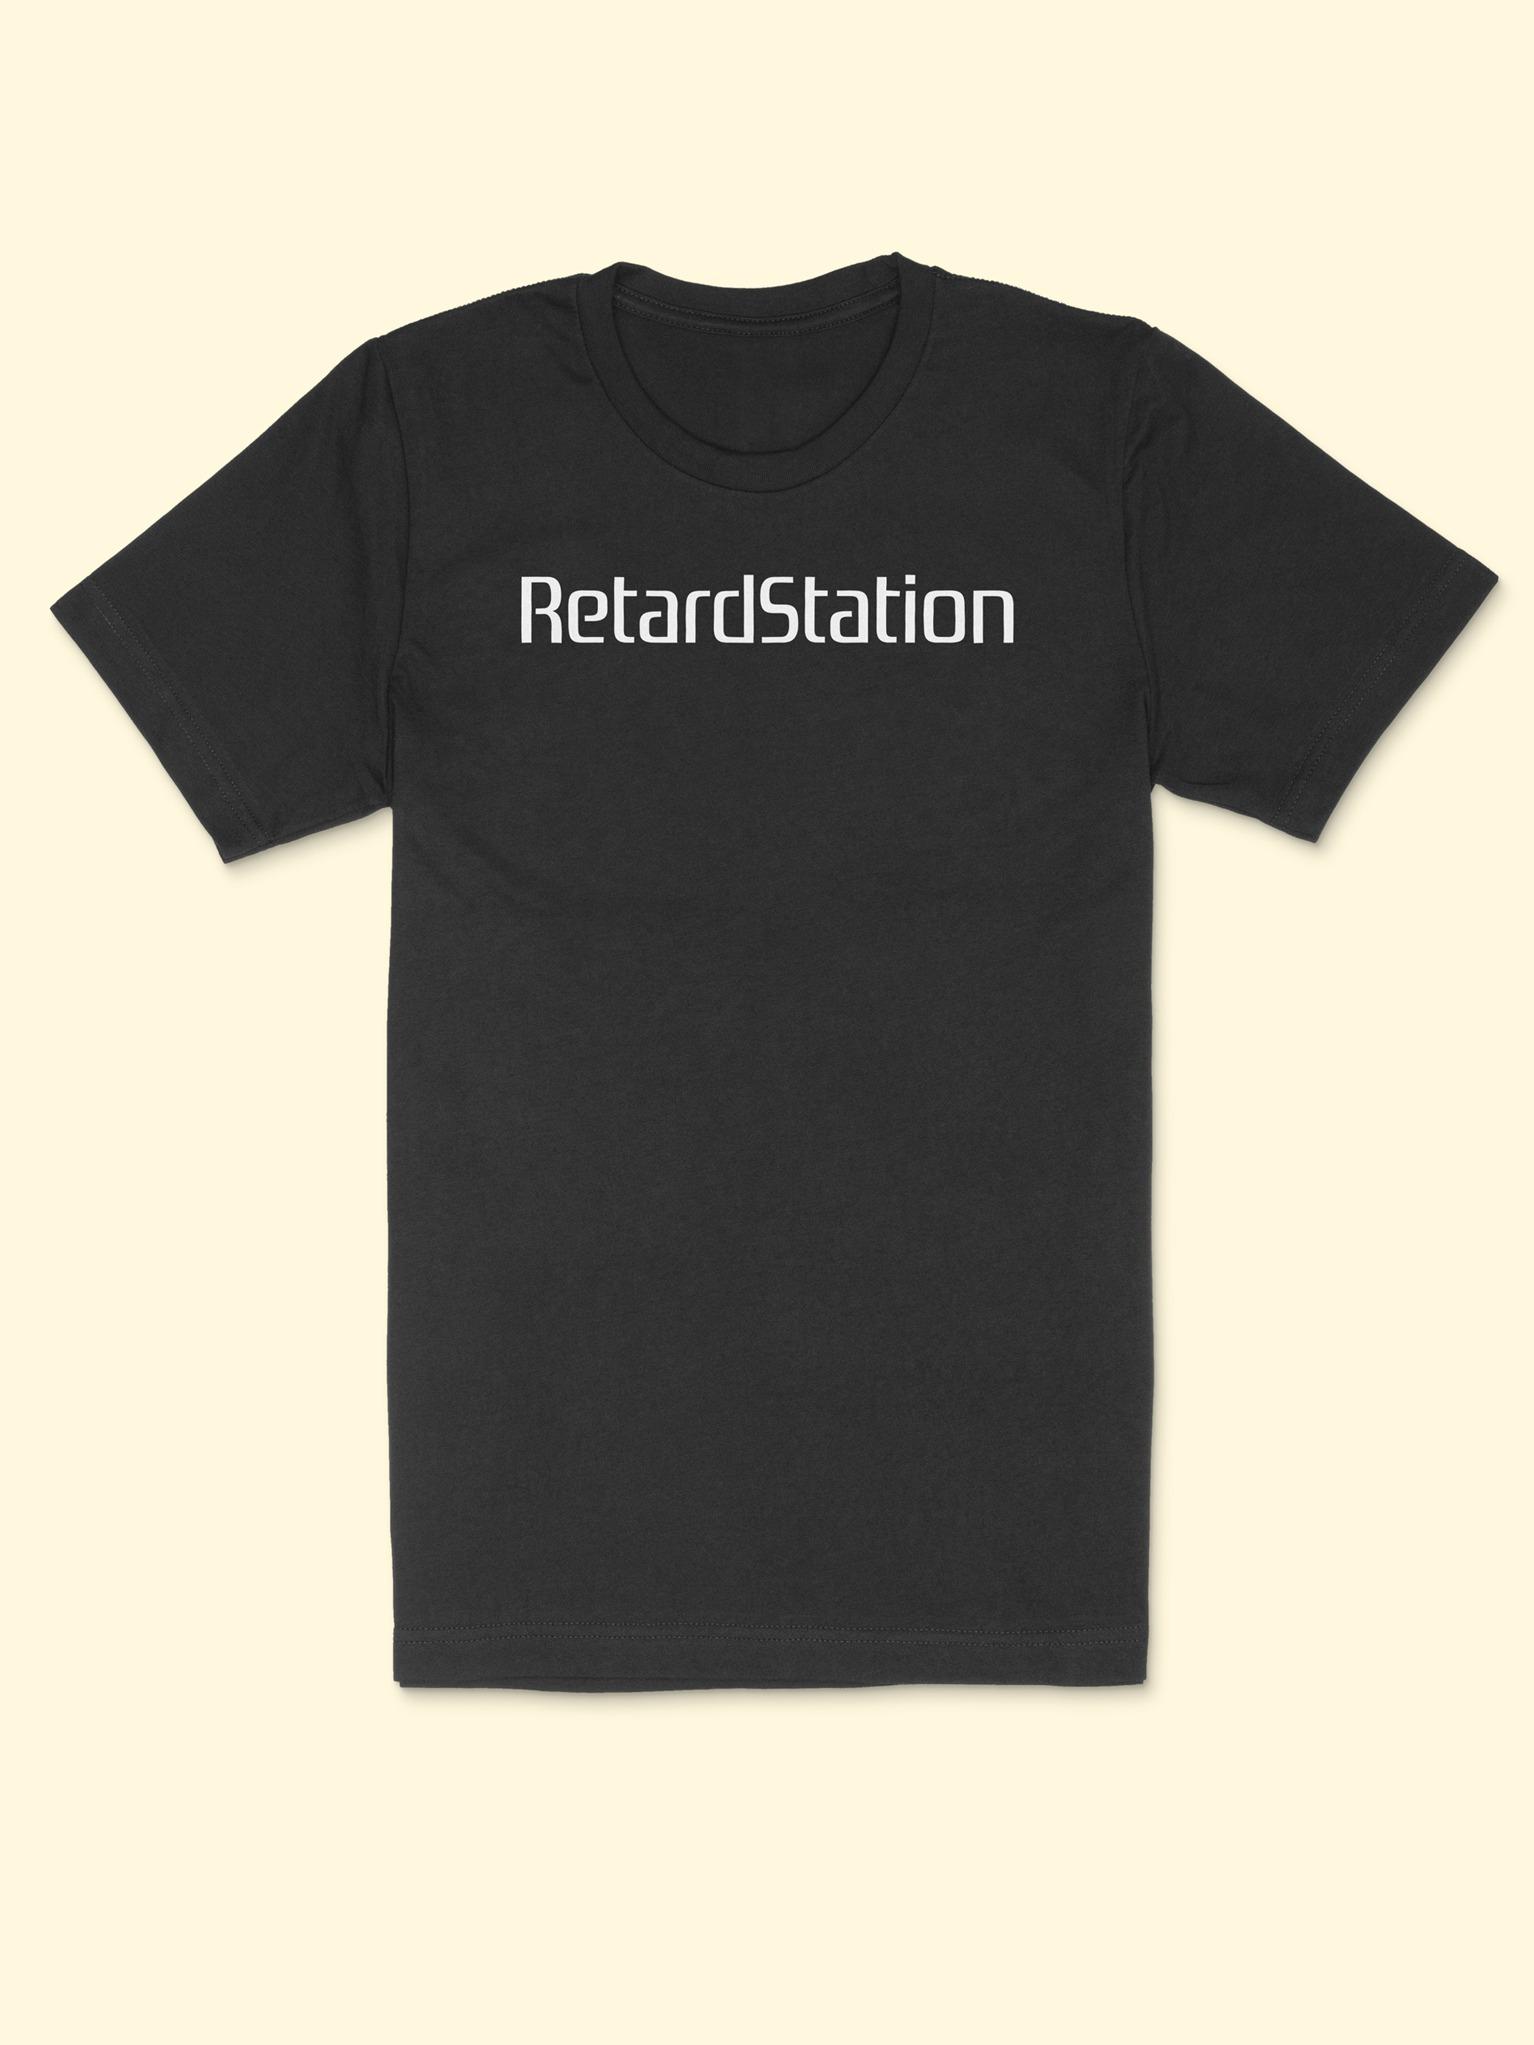 RetardStation T-shirt product image (1)